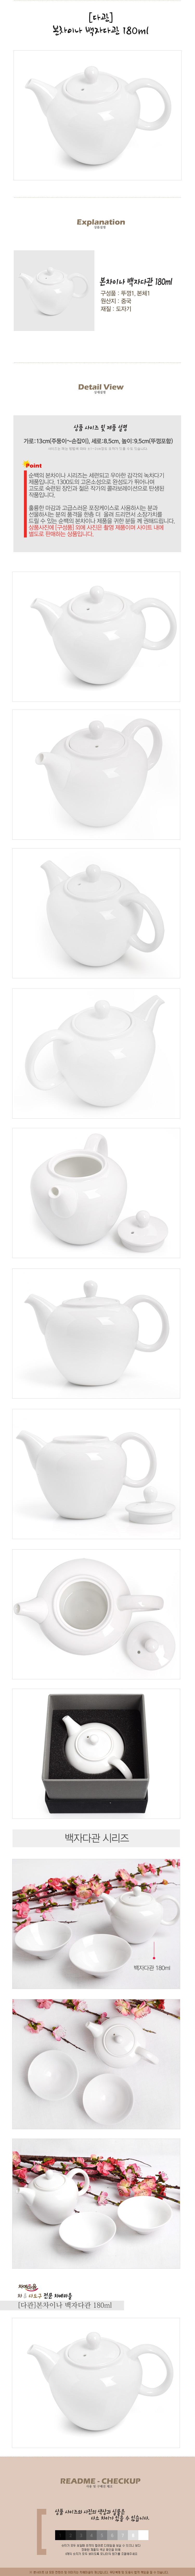 [ PusienpudingDongnam ] 茶杯里 NockChungYu Prop 2pSet(XU001S)